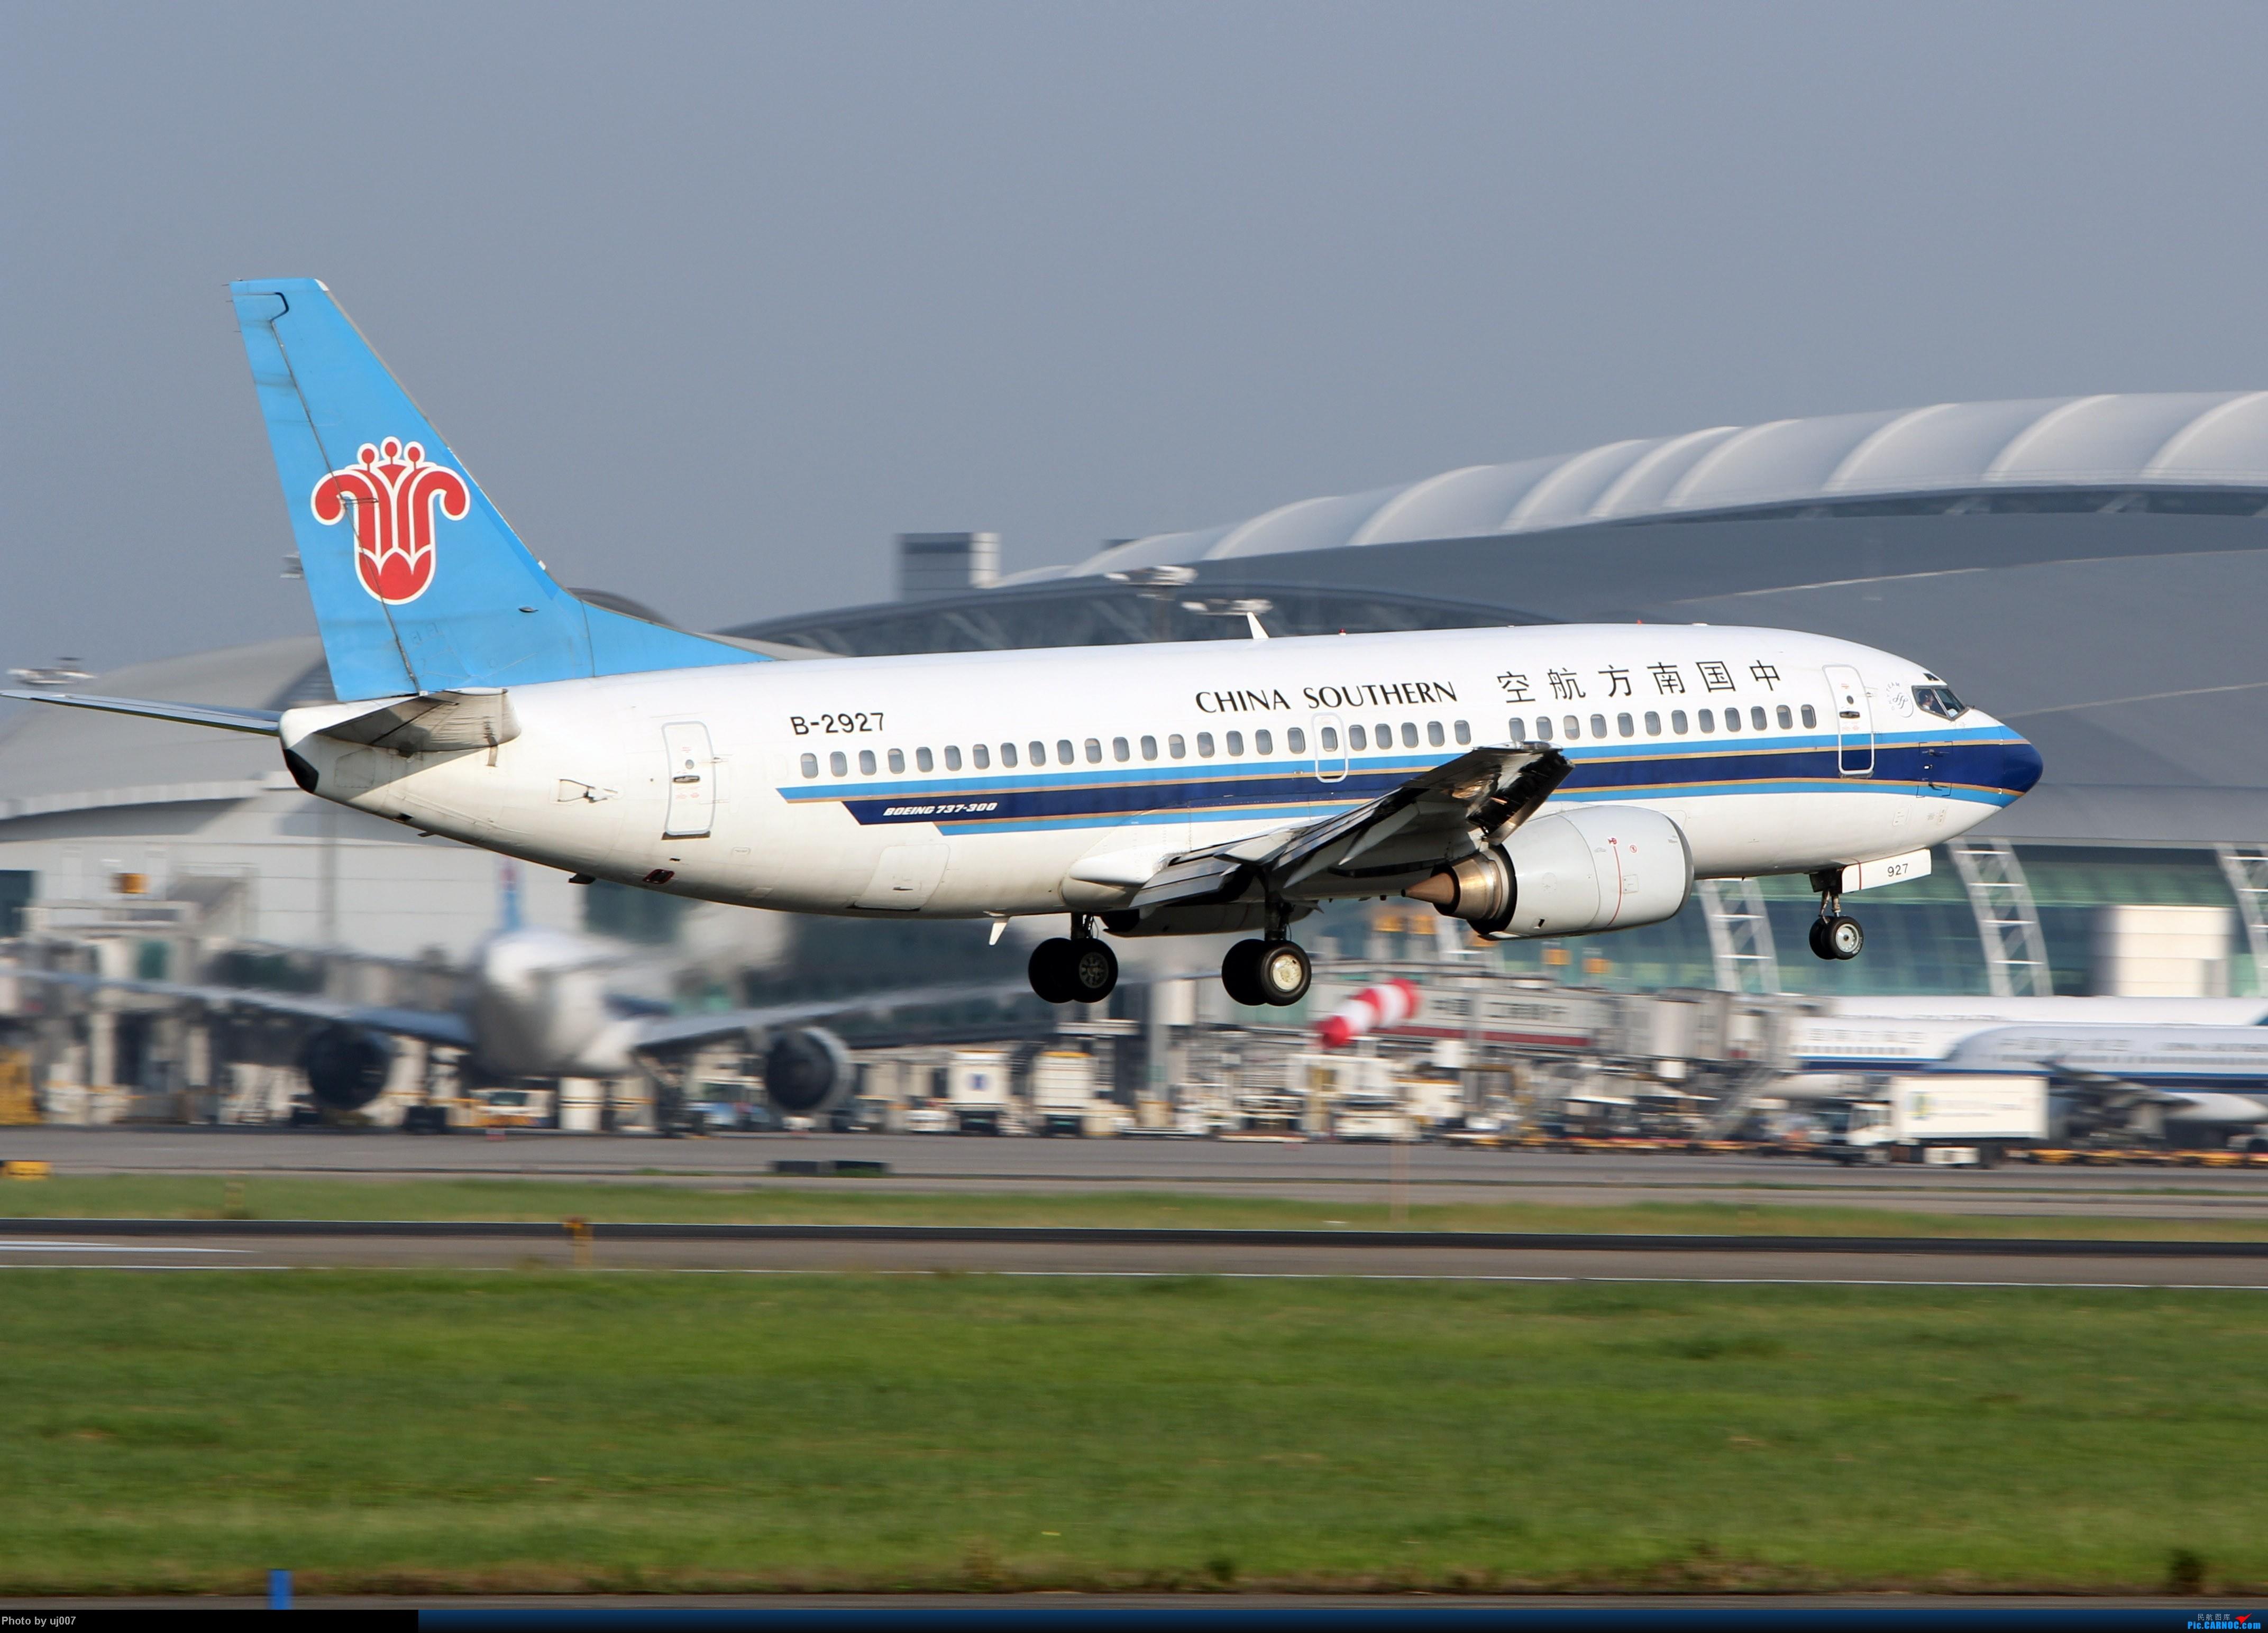 Re:[原创]10月2日白云拍机(大飞机,特别妆,外航,闪灯,擦烟)求指点. BOEING 737-300 B-2972 广州白云国际机场